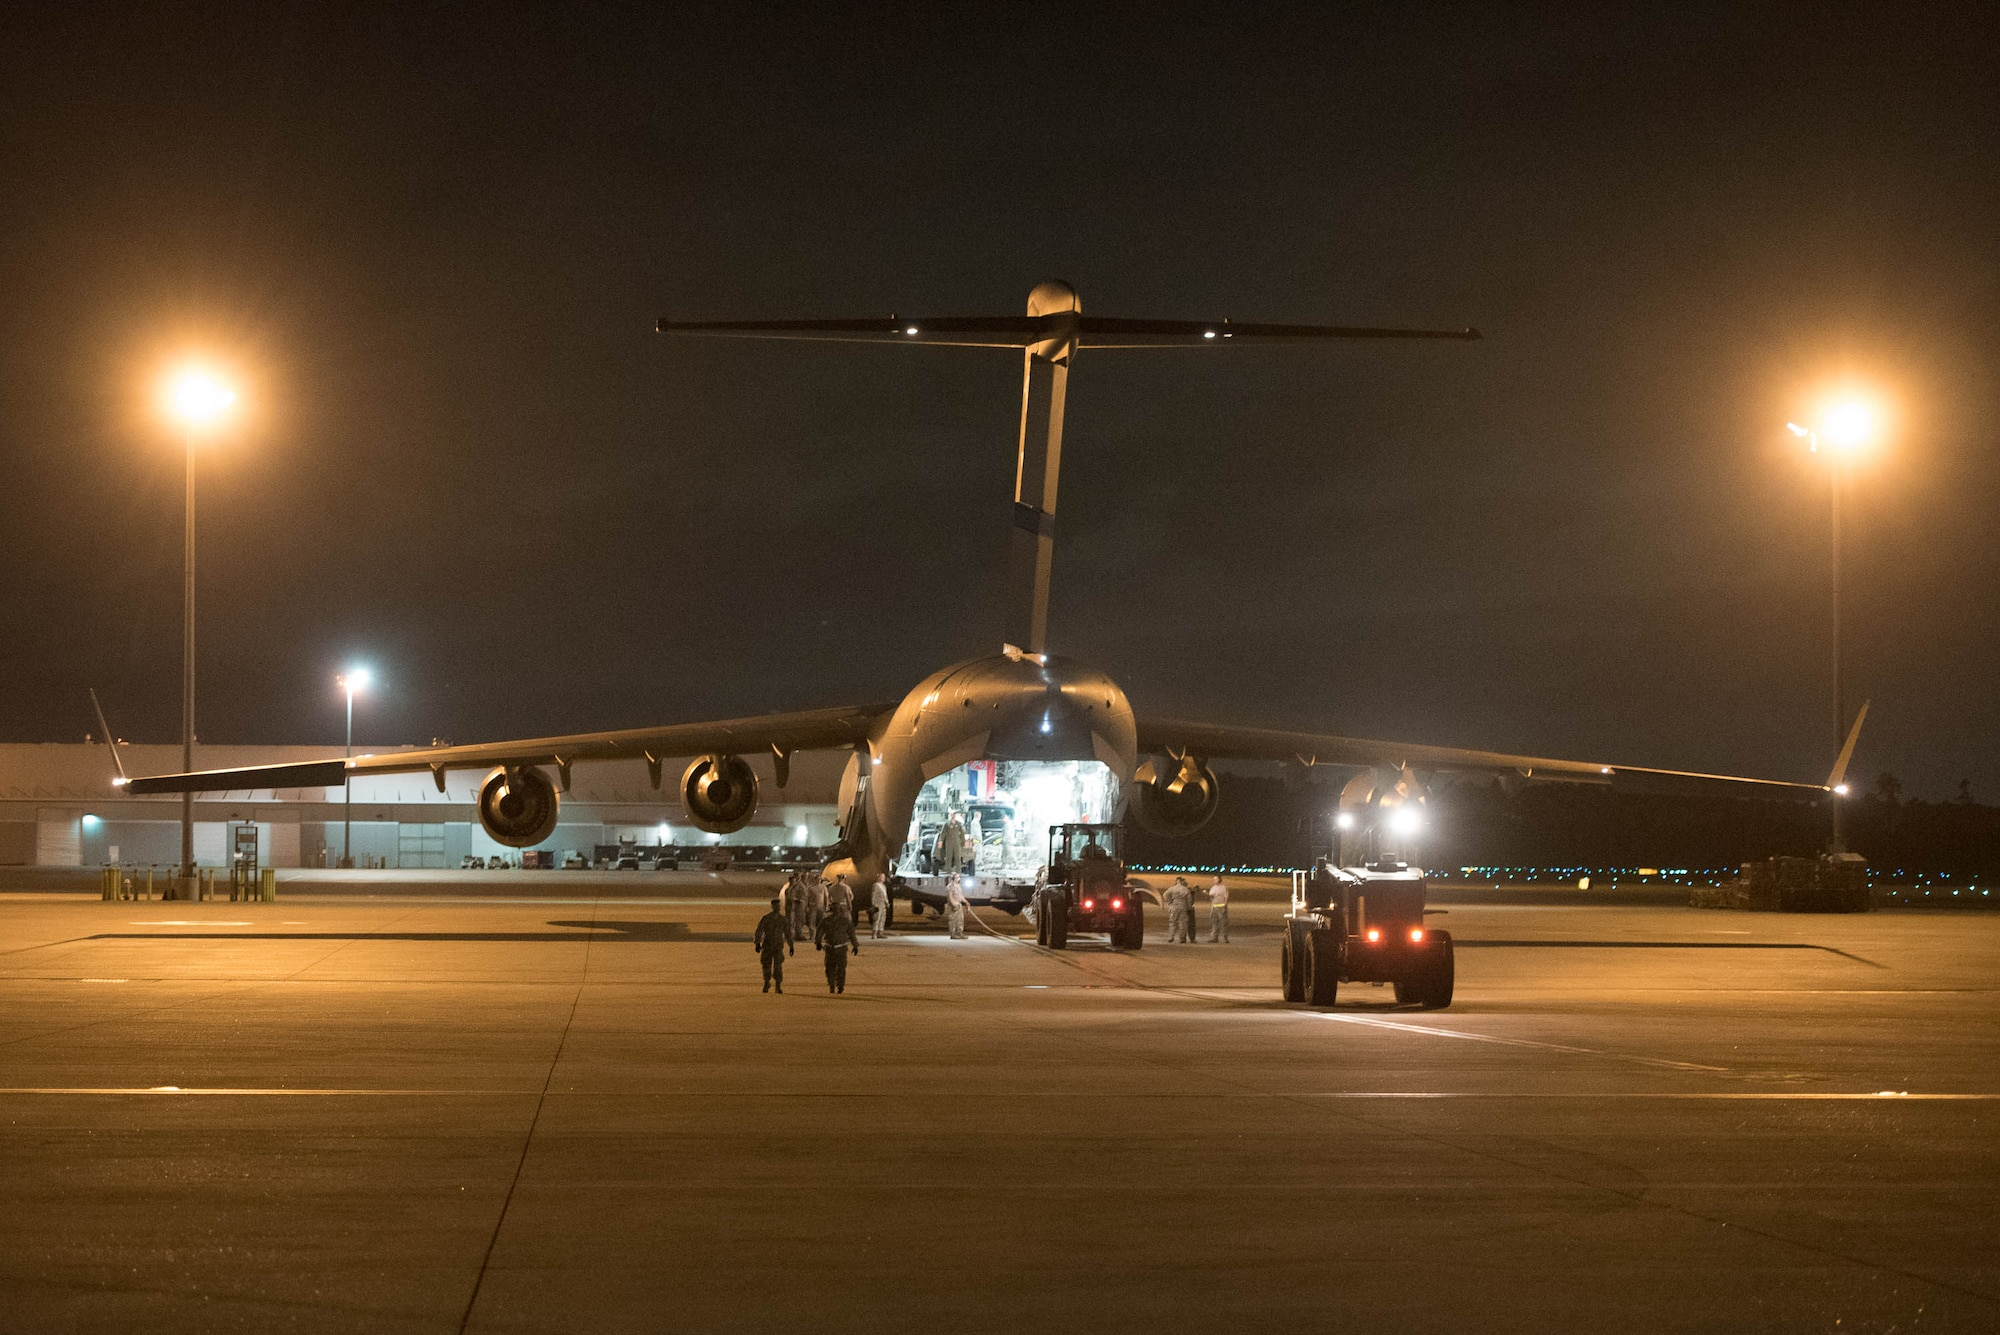 Kentucky Air Guard establishes aeromedical evacuation hub for hurricane relief